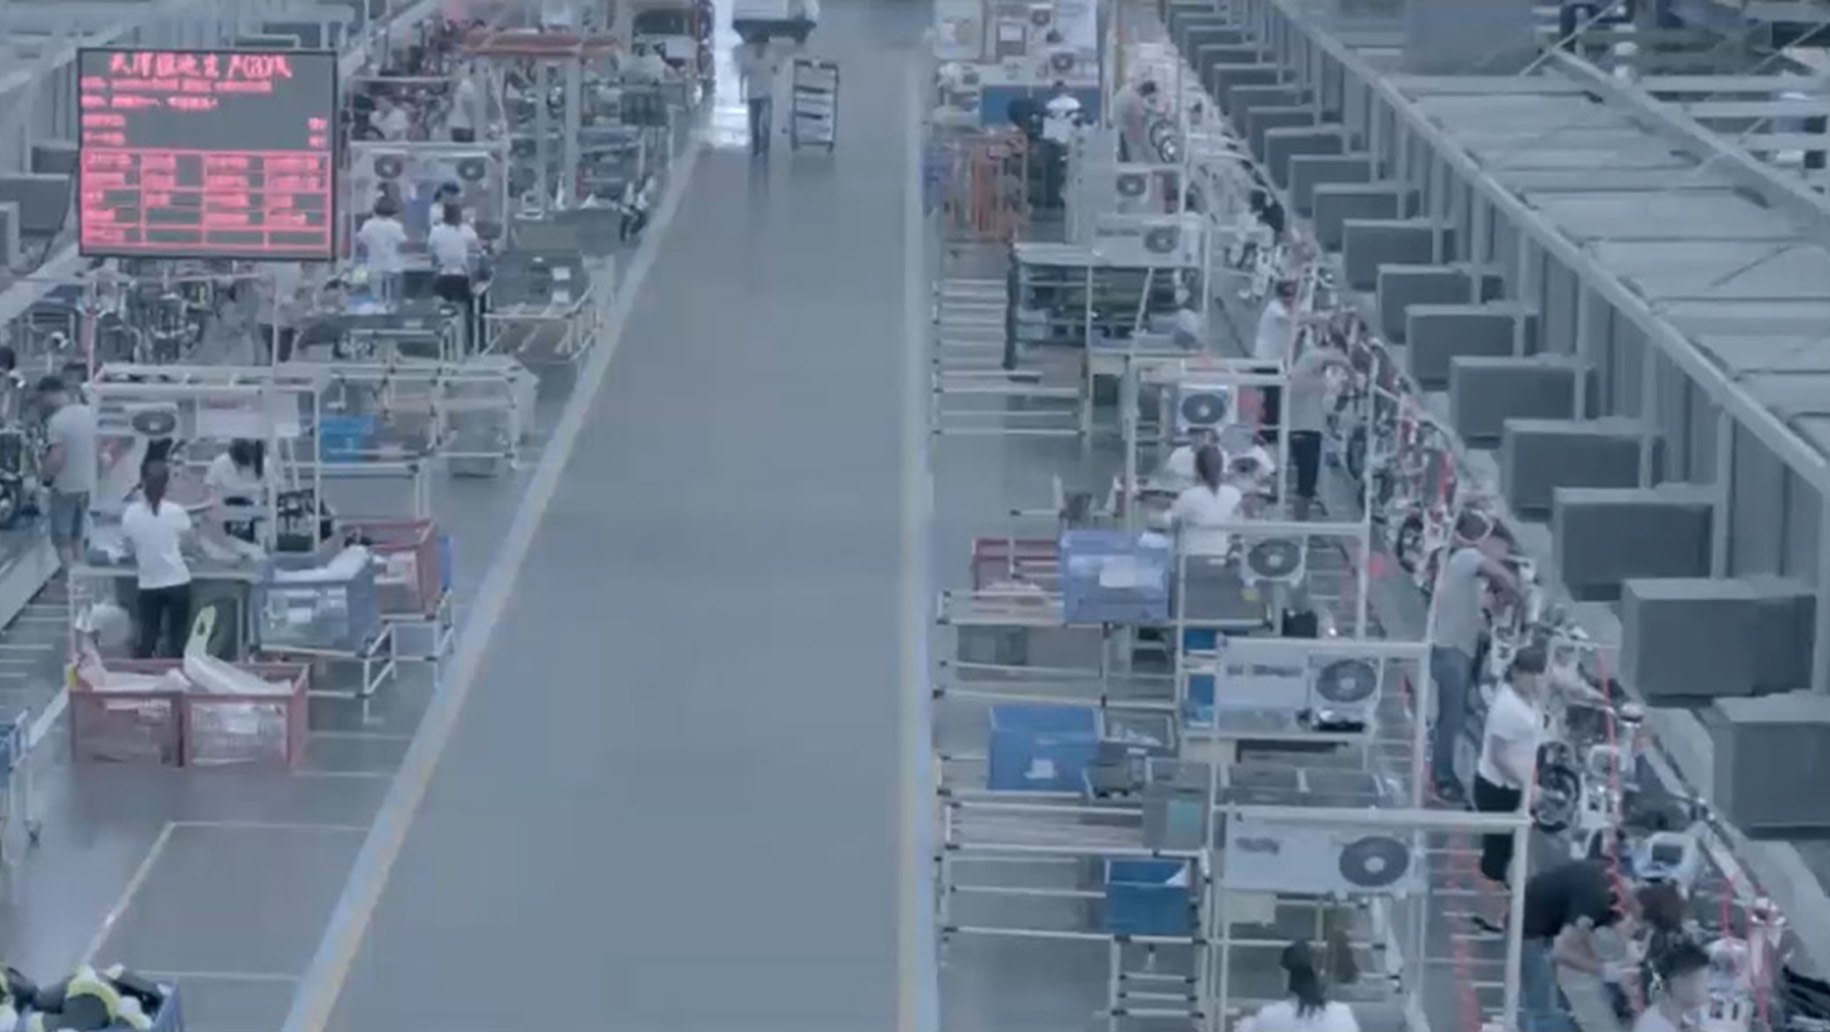 Attività di produzione in Cina.